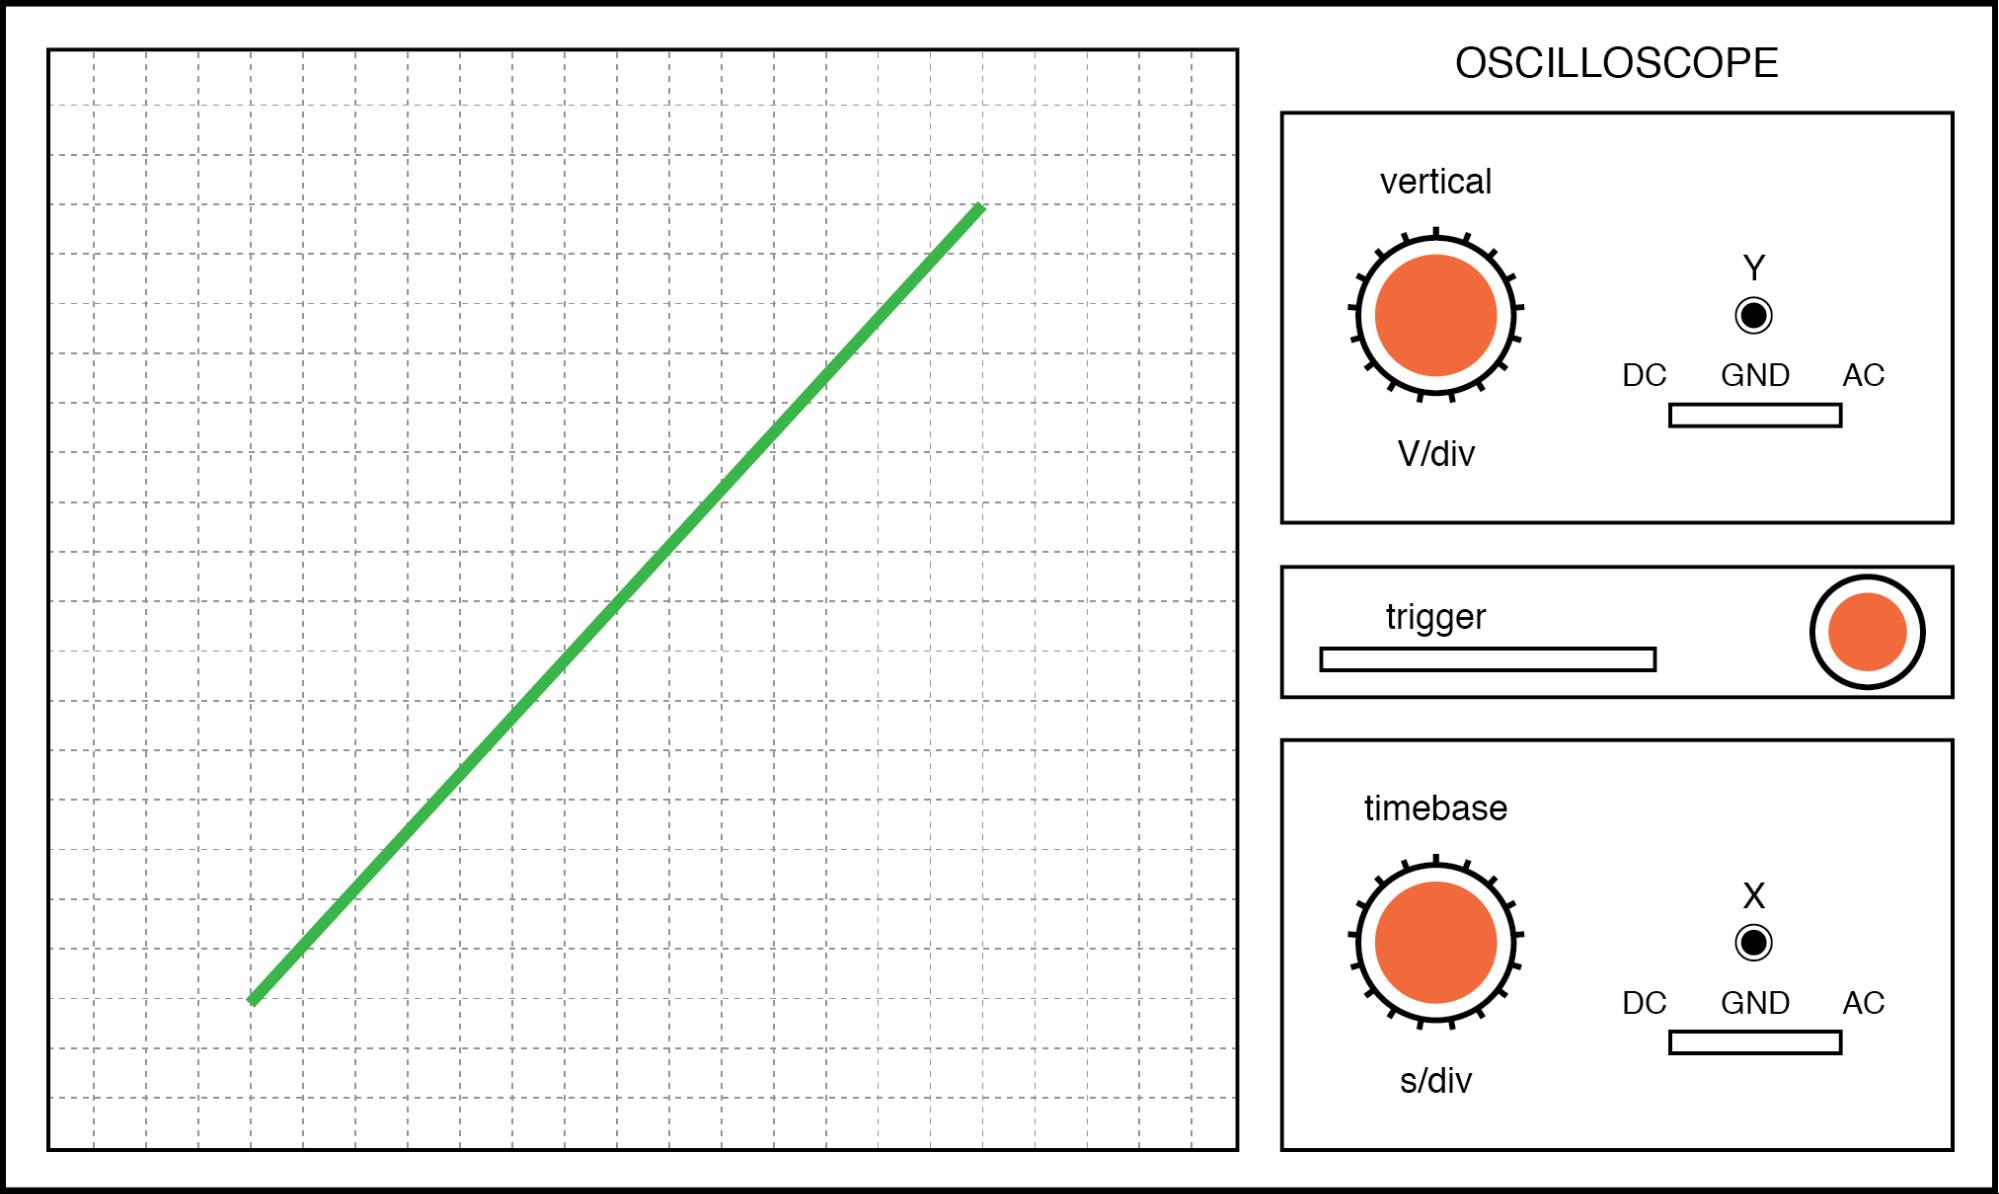 Lissajous figure: same frequency, zero degrees phase shift.